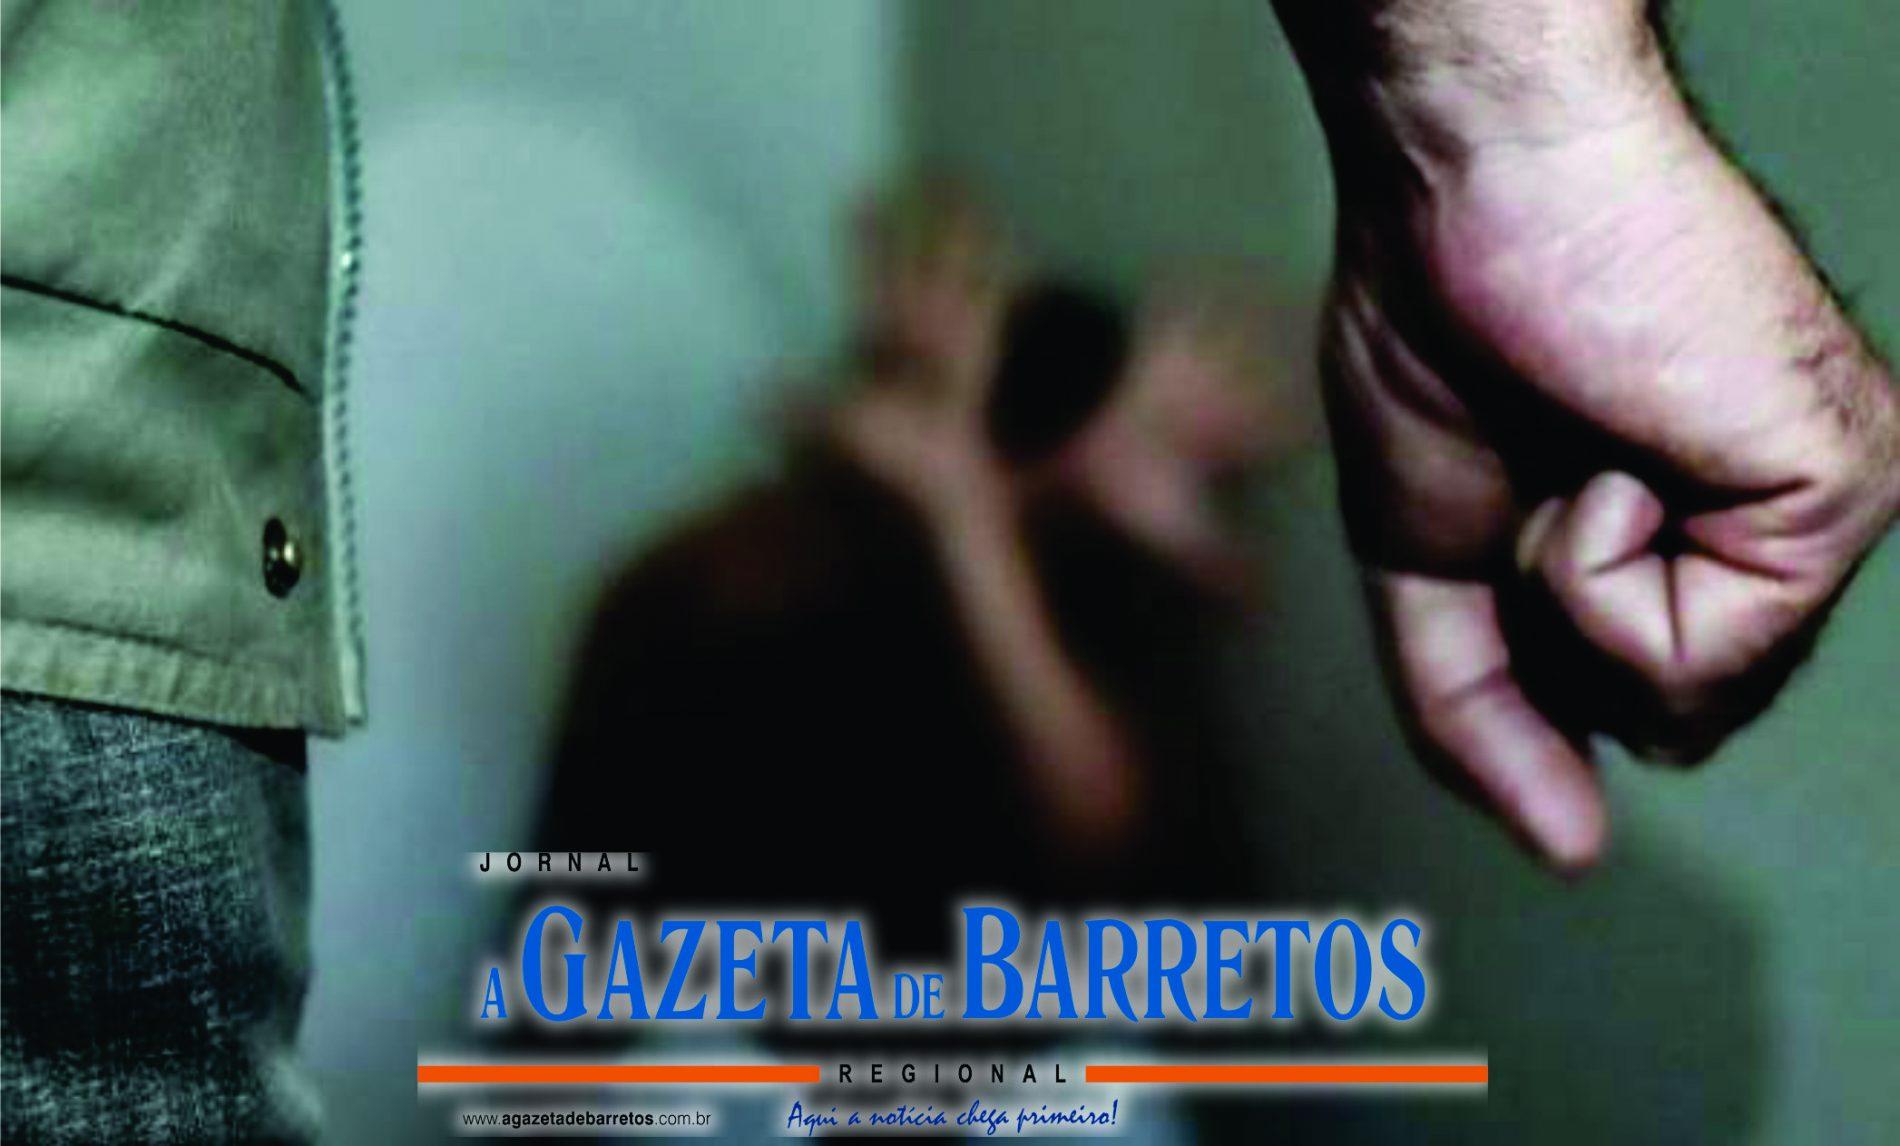 SEVERÍNIA: Menina de 13 anos grávida é agredida pelo amásio de 25 anos